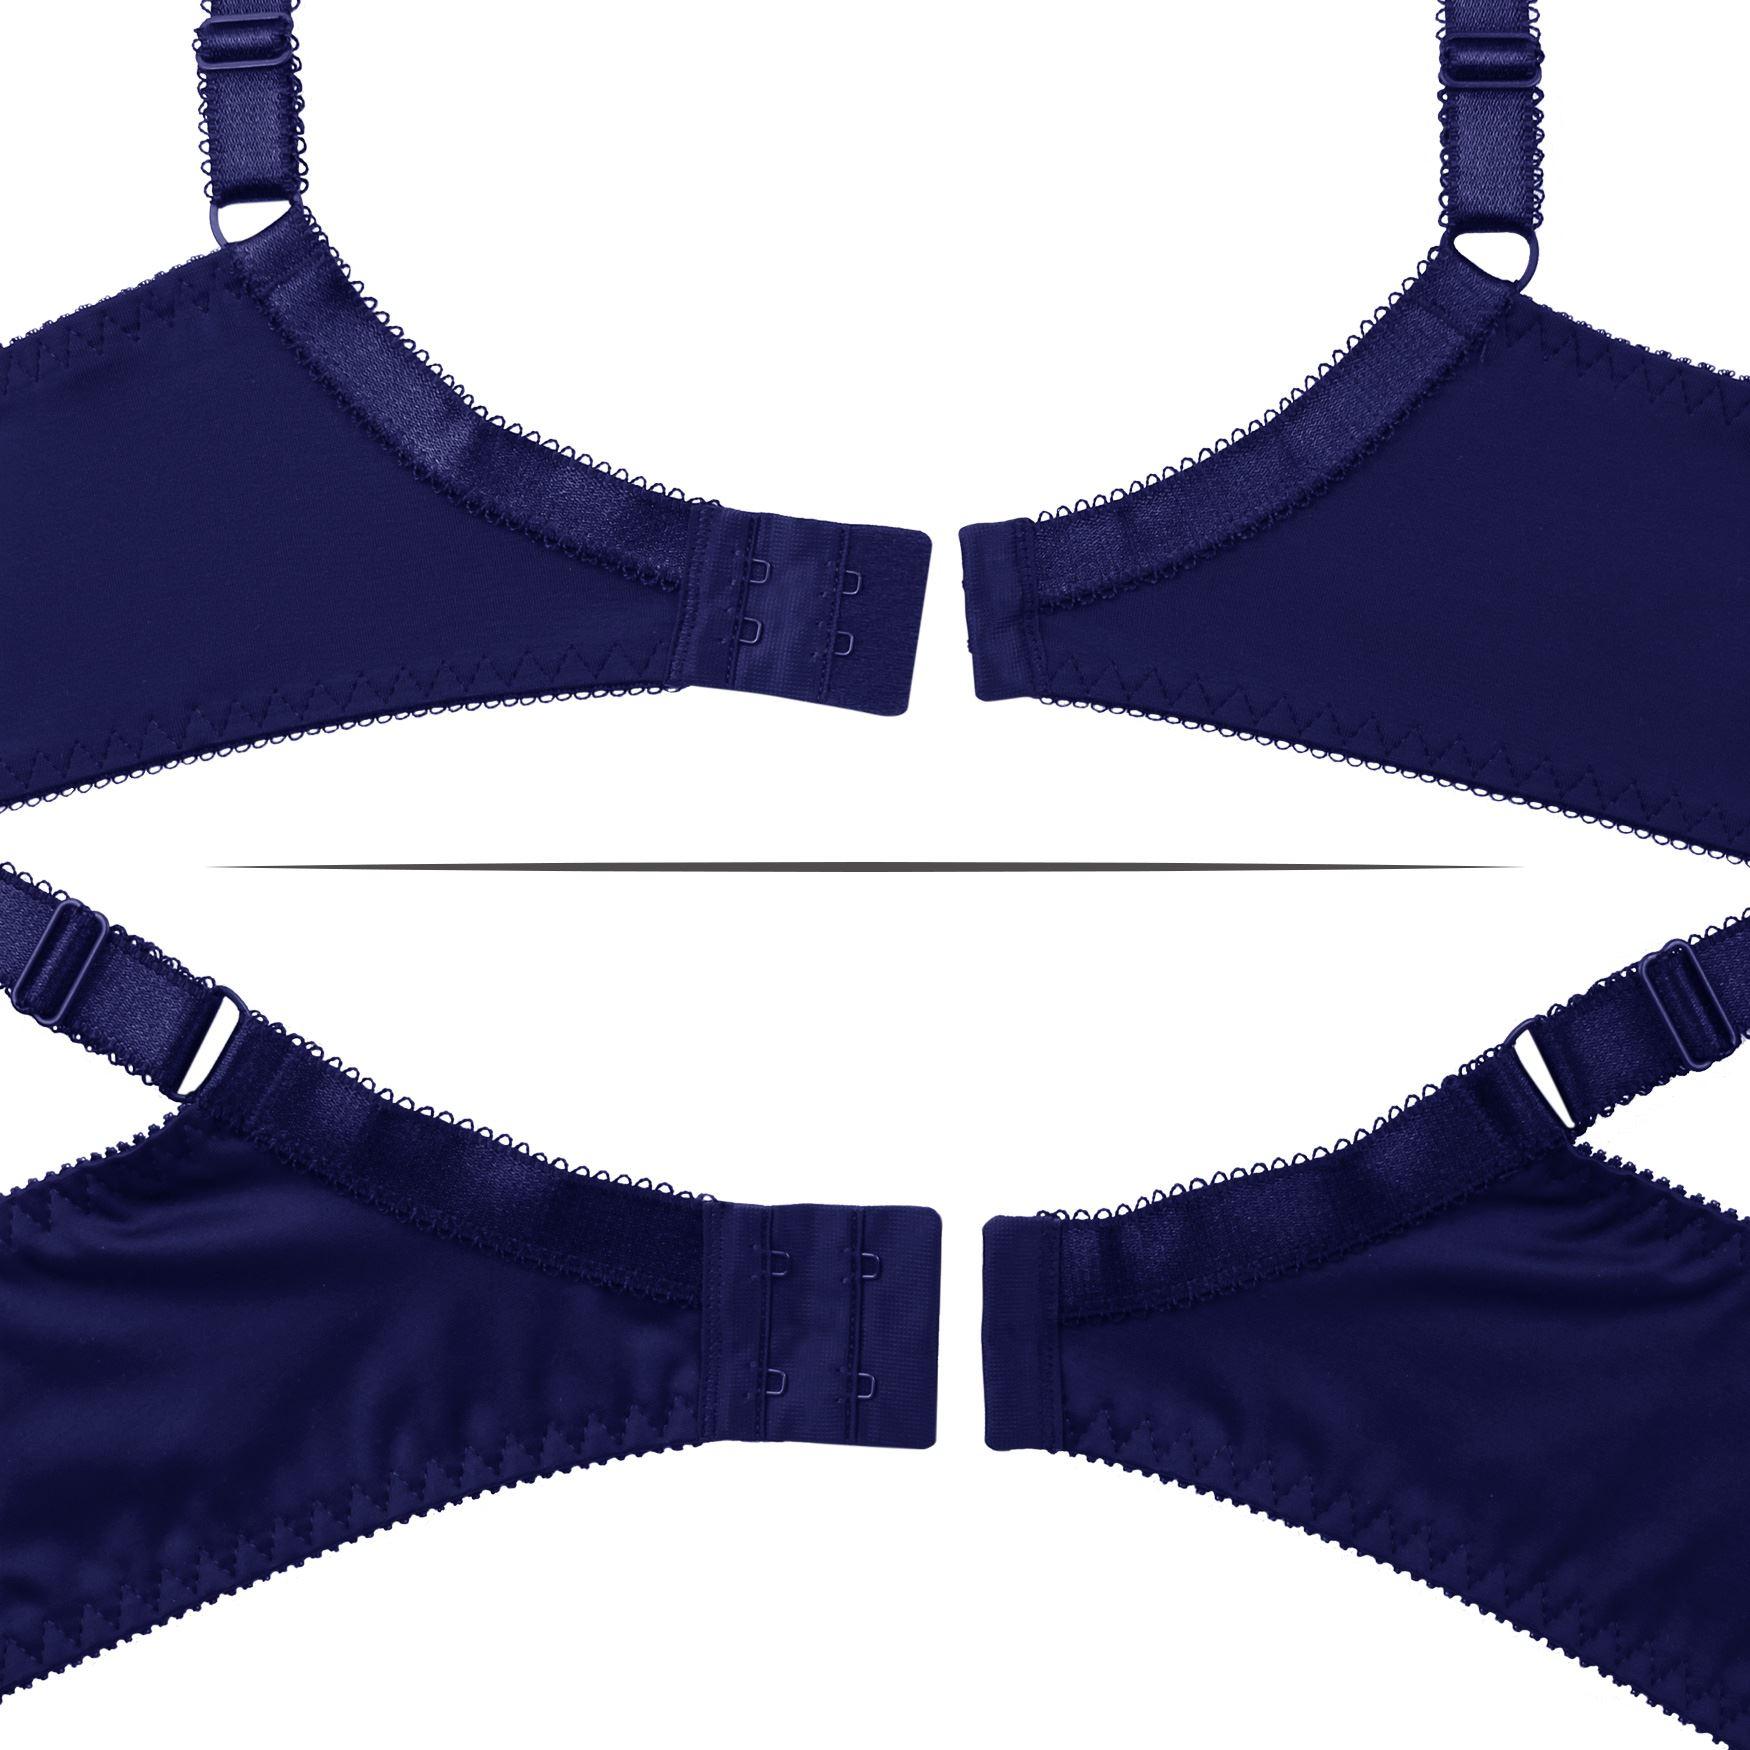 Plus-Size-Bra-Full-Coverage-Underwire-Minimizer-Padded-Comfortable-Lace-Figure thumbnail 16